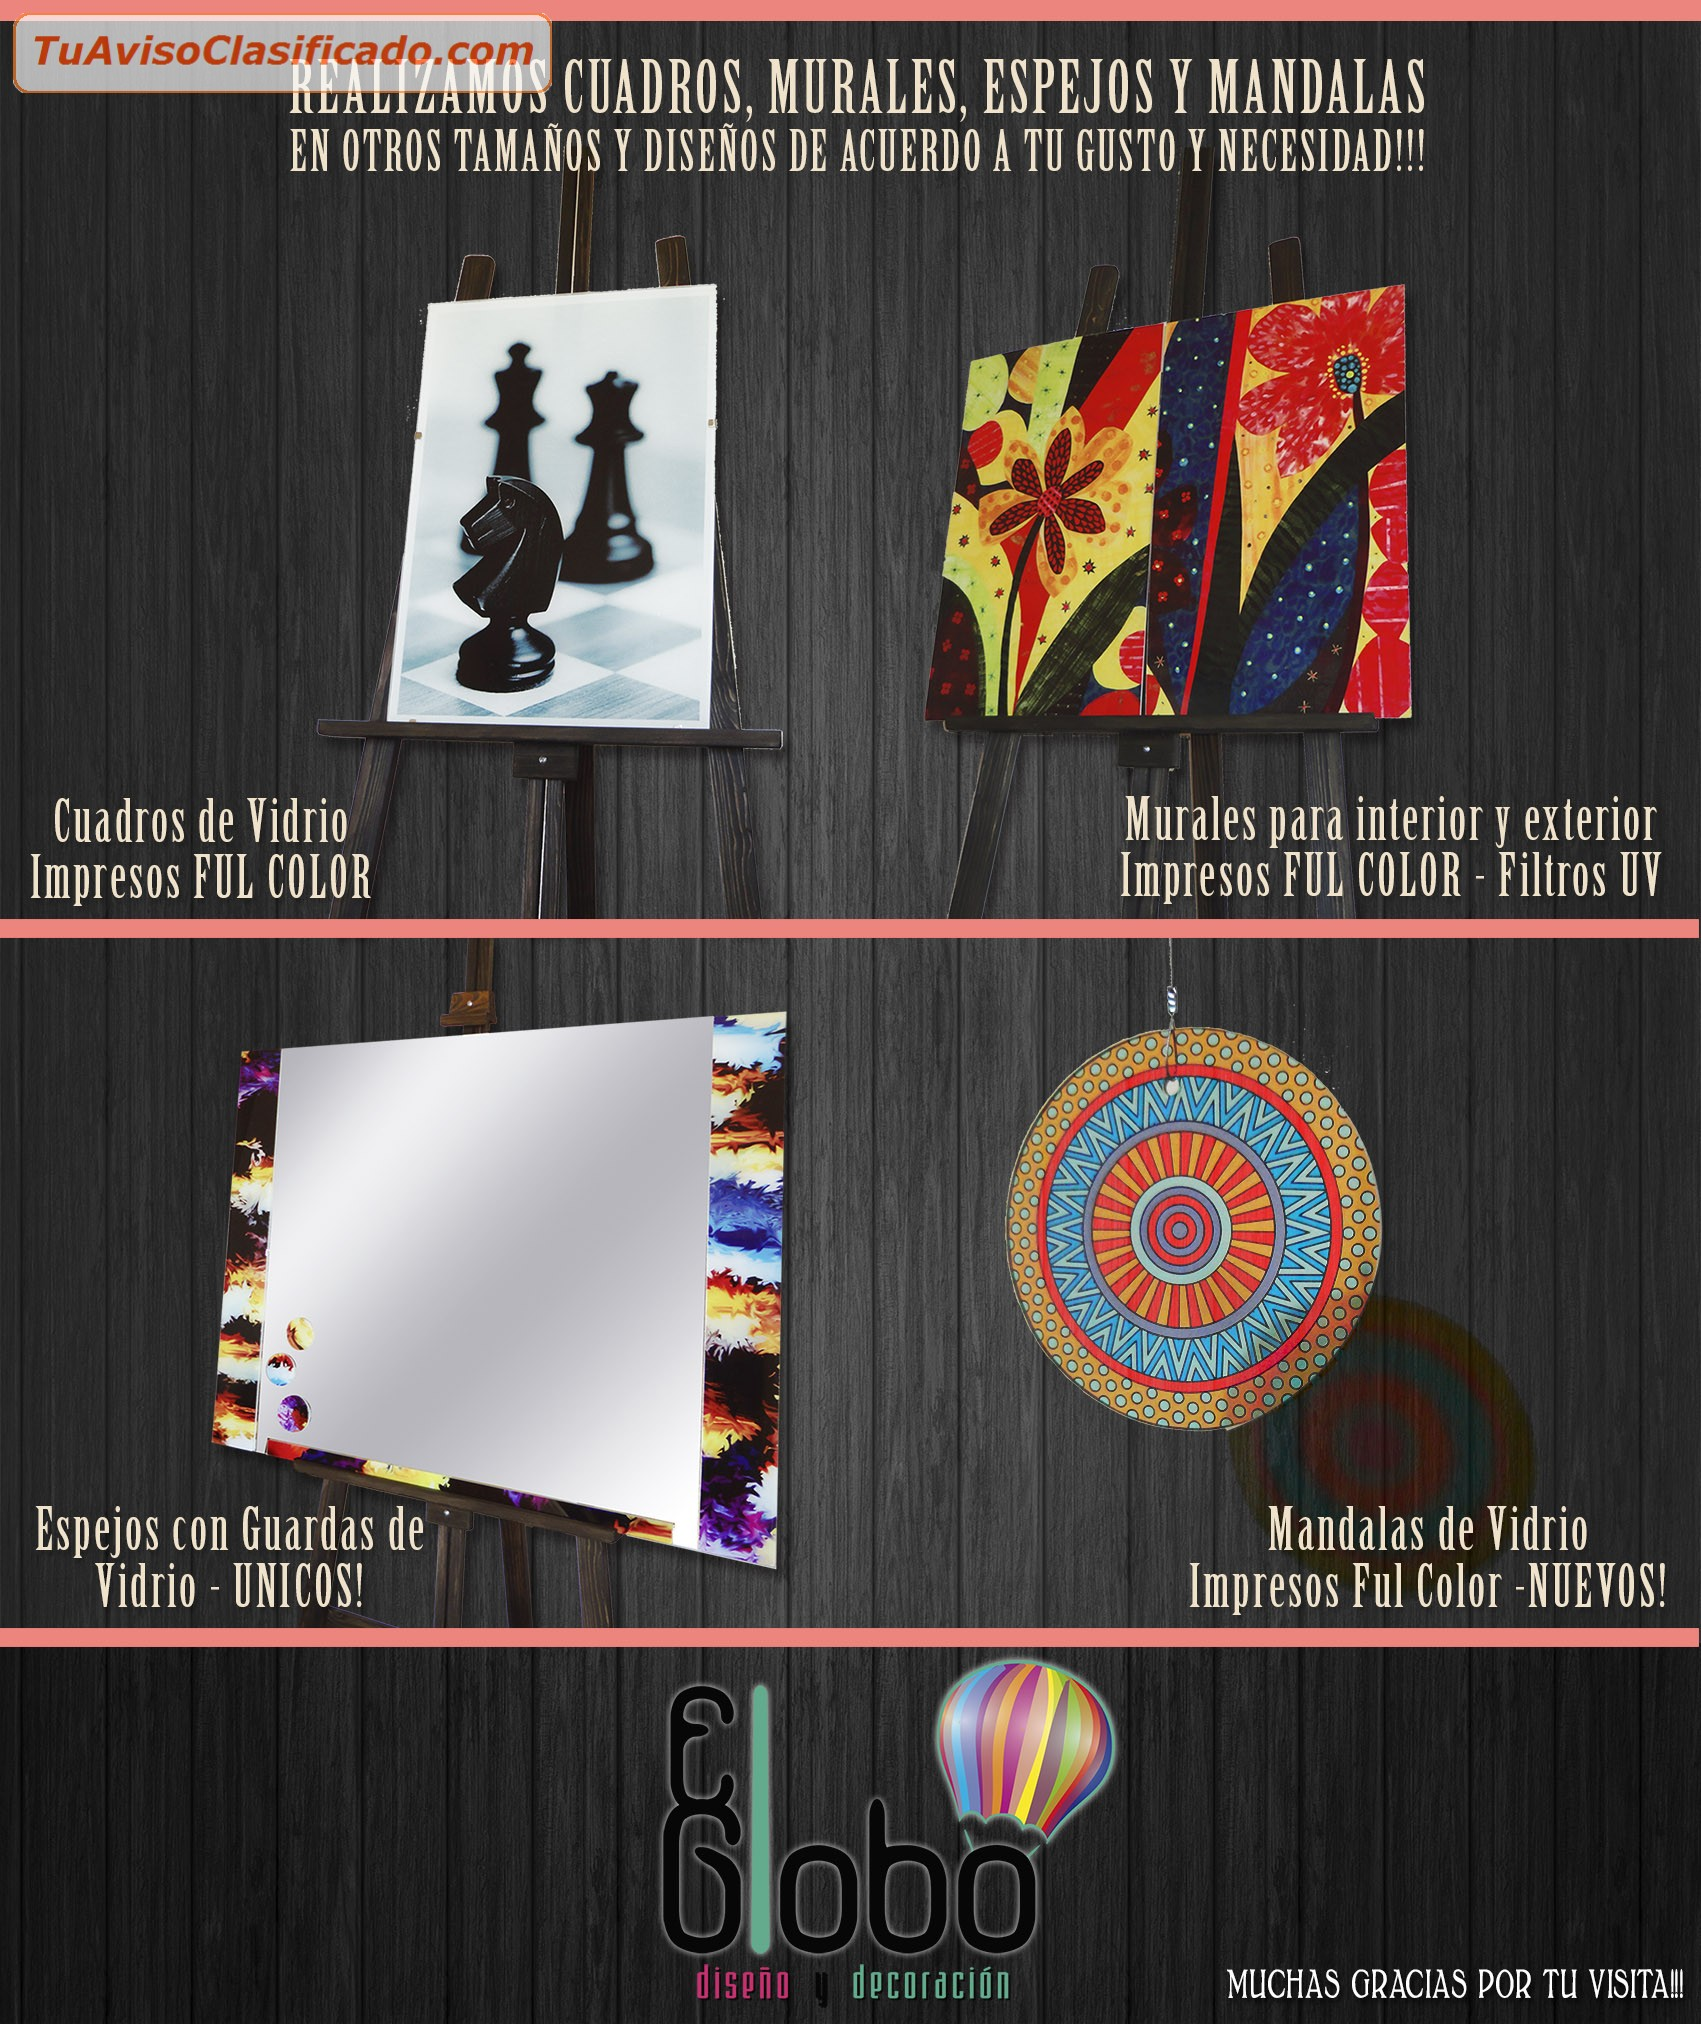 Free download cuadros modernos para sala descuento hogar - Cuadro decorativos modernos ...